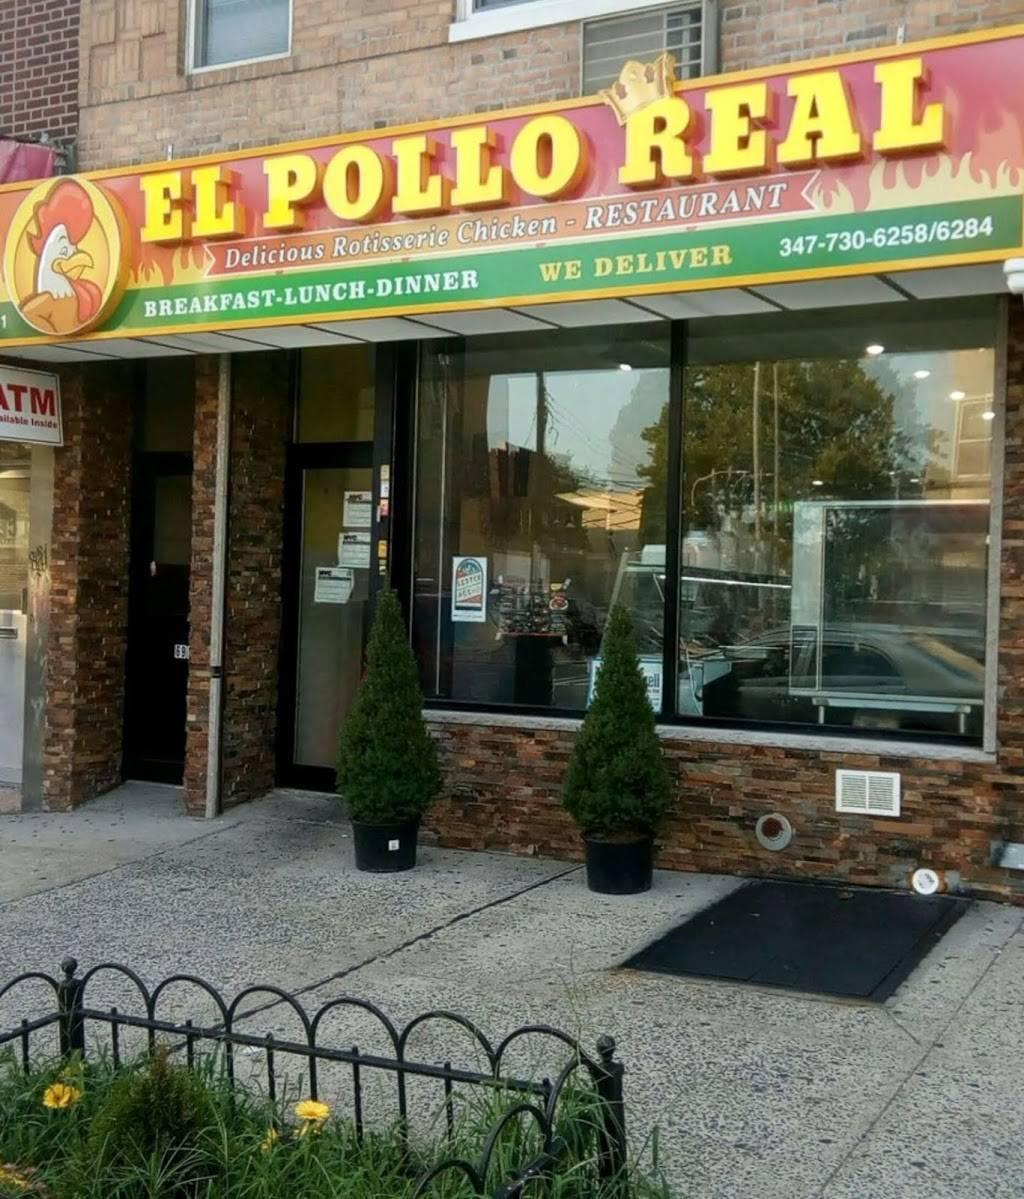 El Pollo Real | restaurant | 69-51 Grand Ave, Flushing, NY 11378, USA | 3477306258 OR +1 347-730-6258